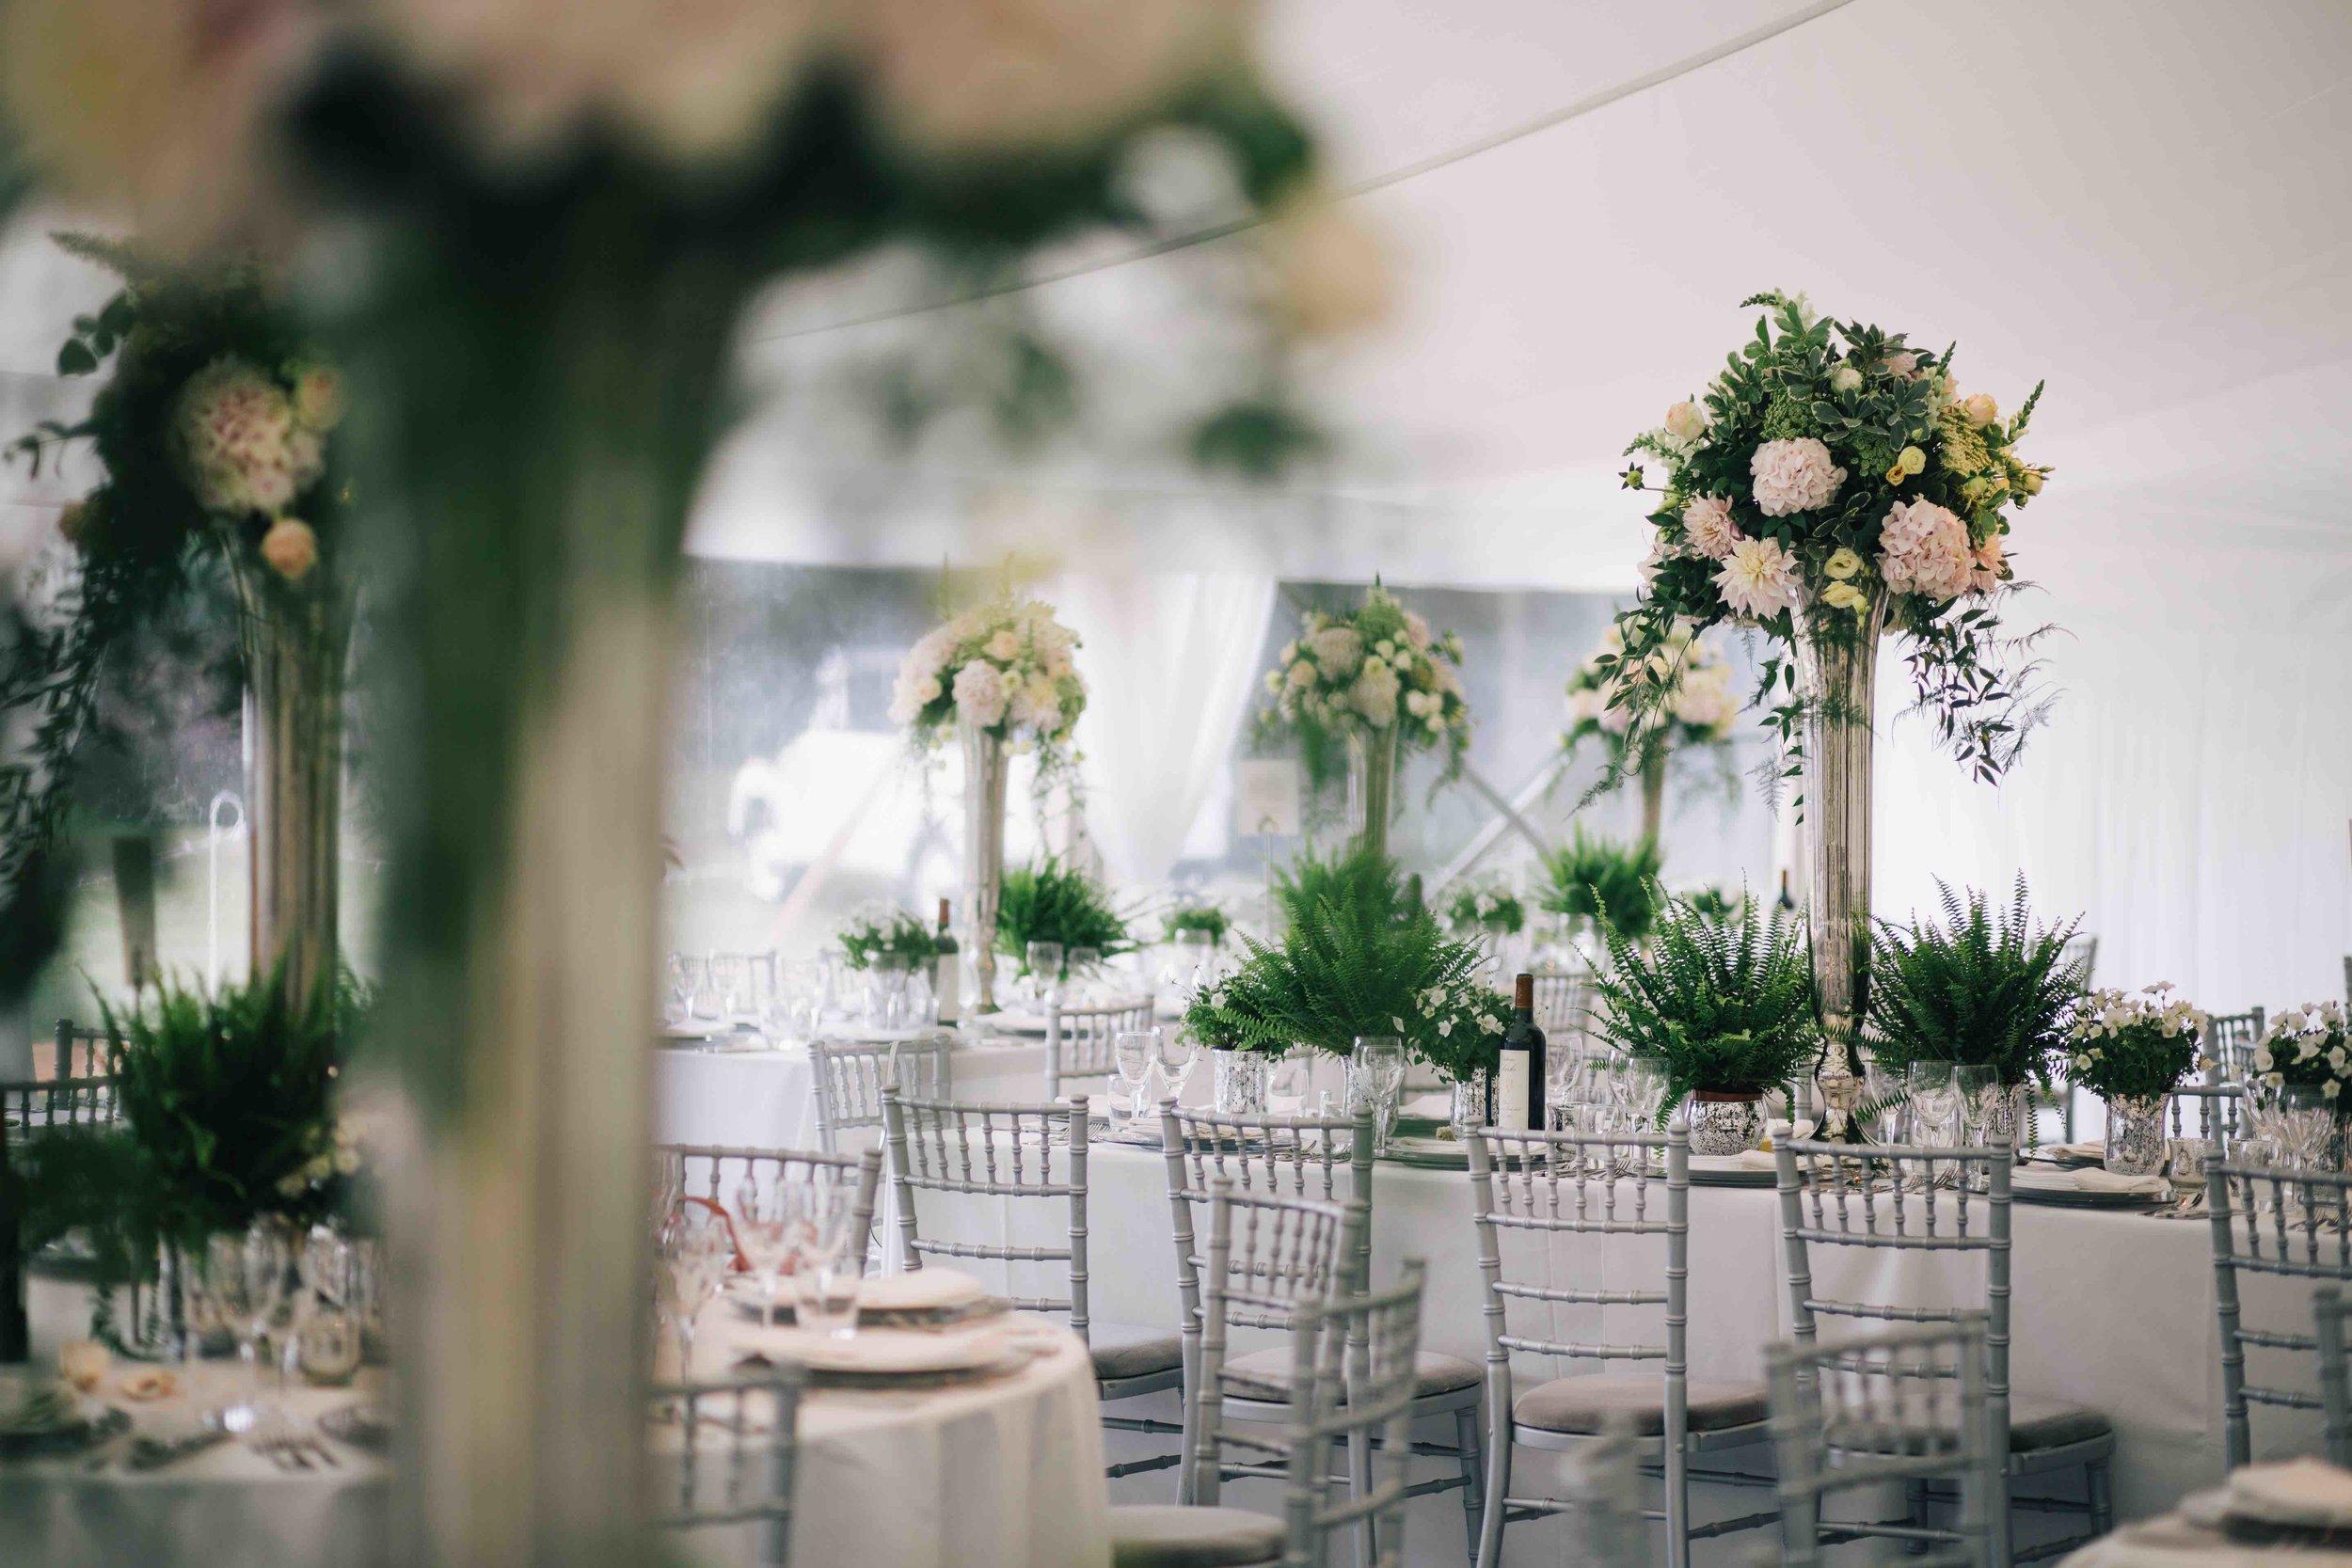 Littleton-Rose-Botanical-Wedding-Cornwall-Wedding-Planners-Florals.jpg